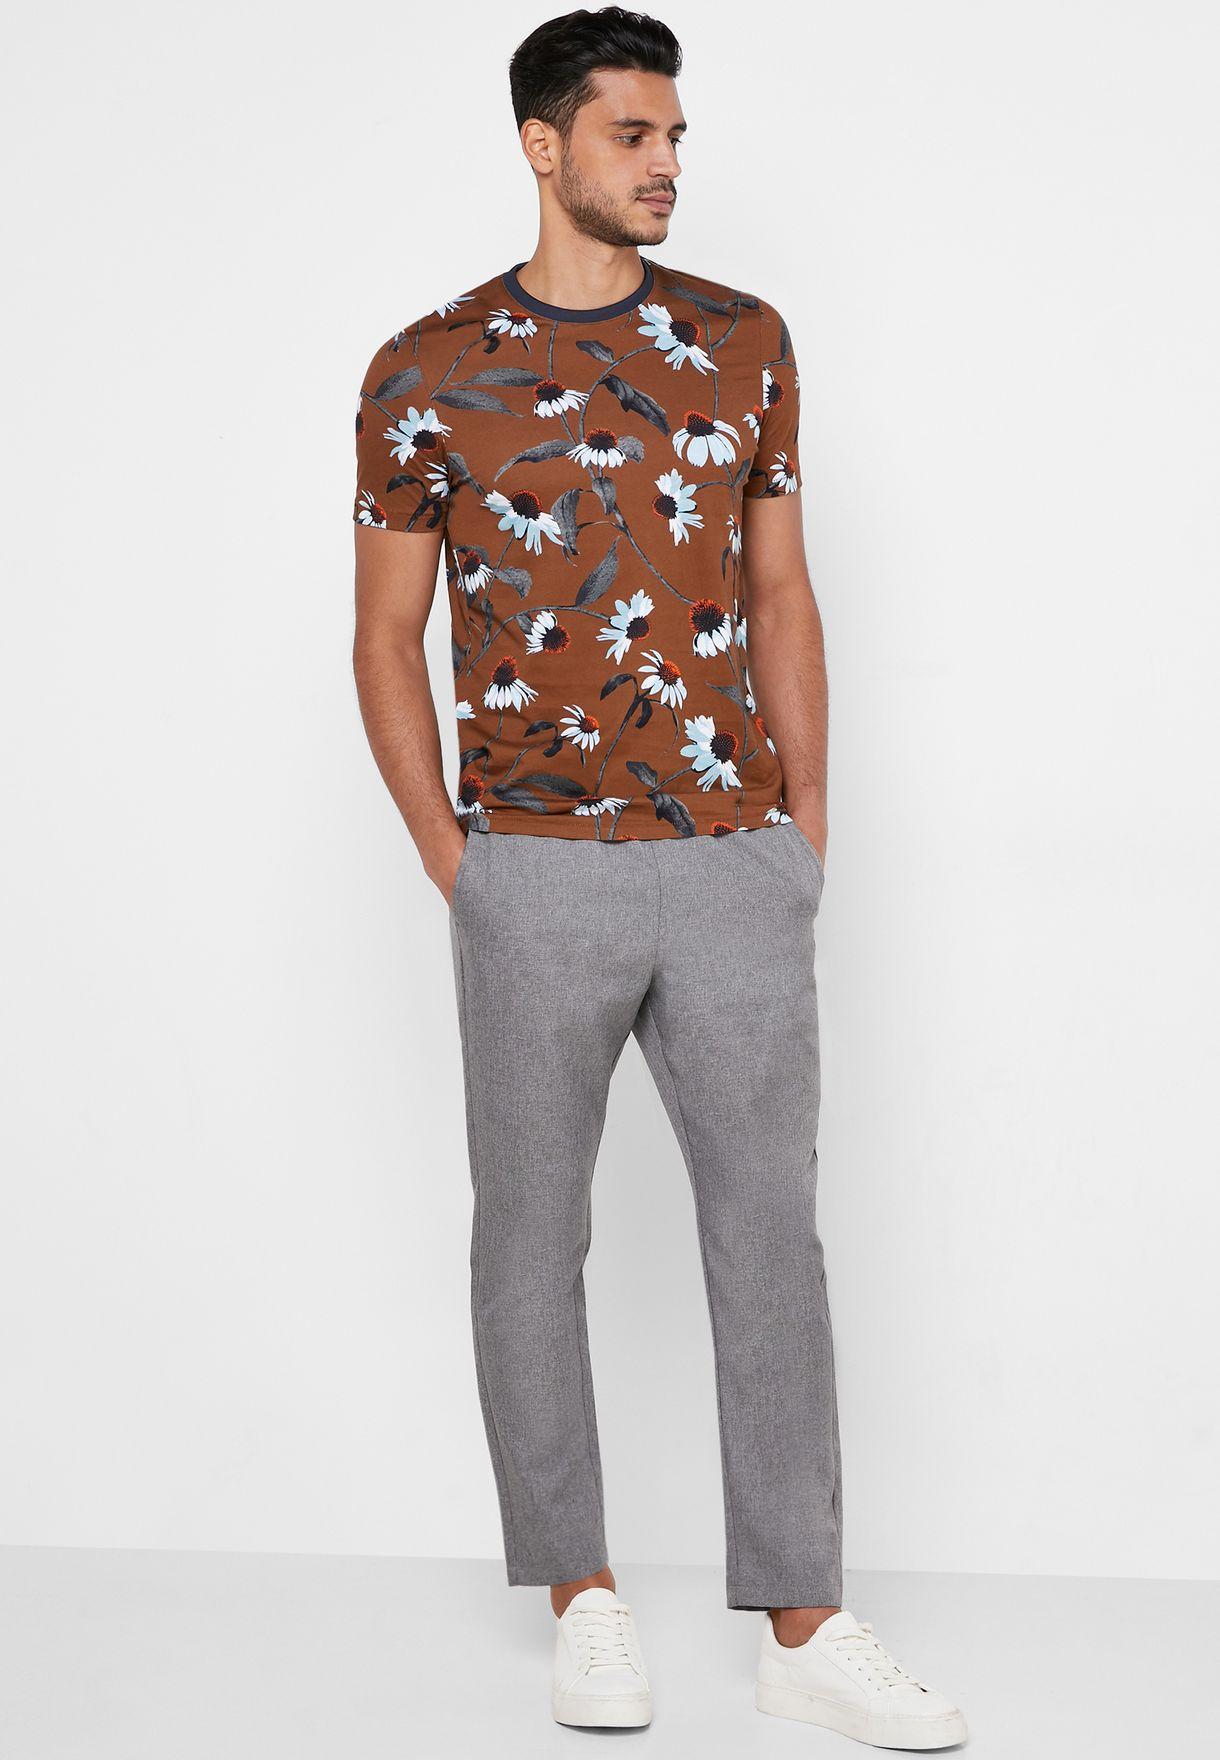 Flower print Crew Neck T-shirt